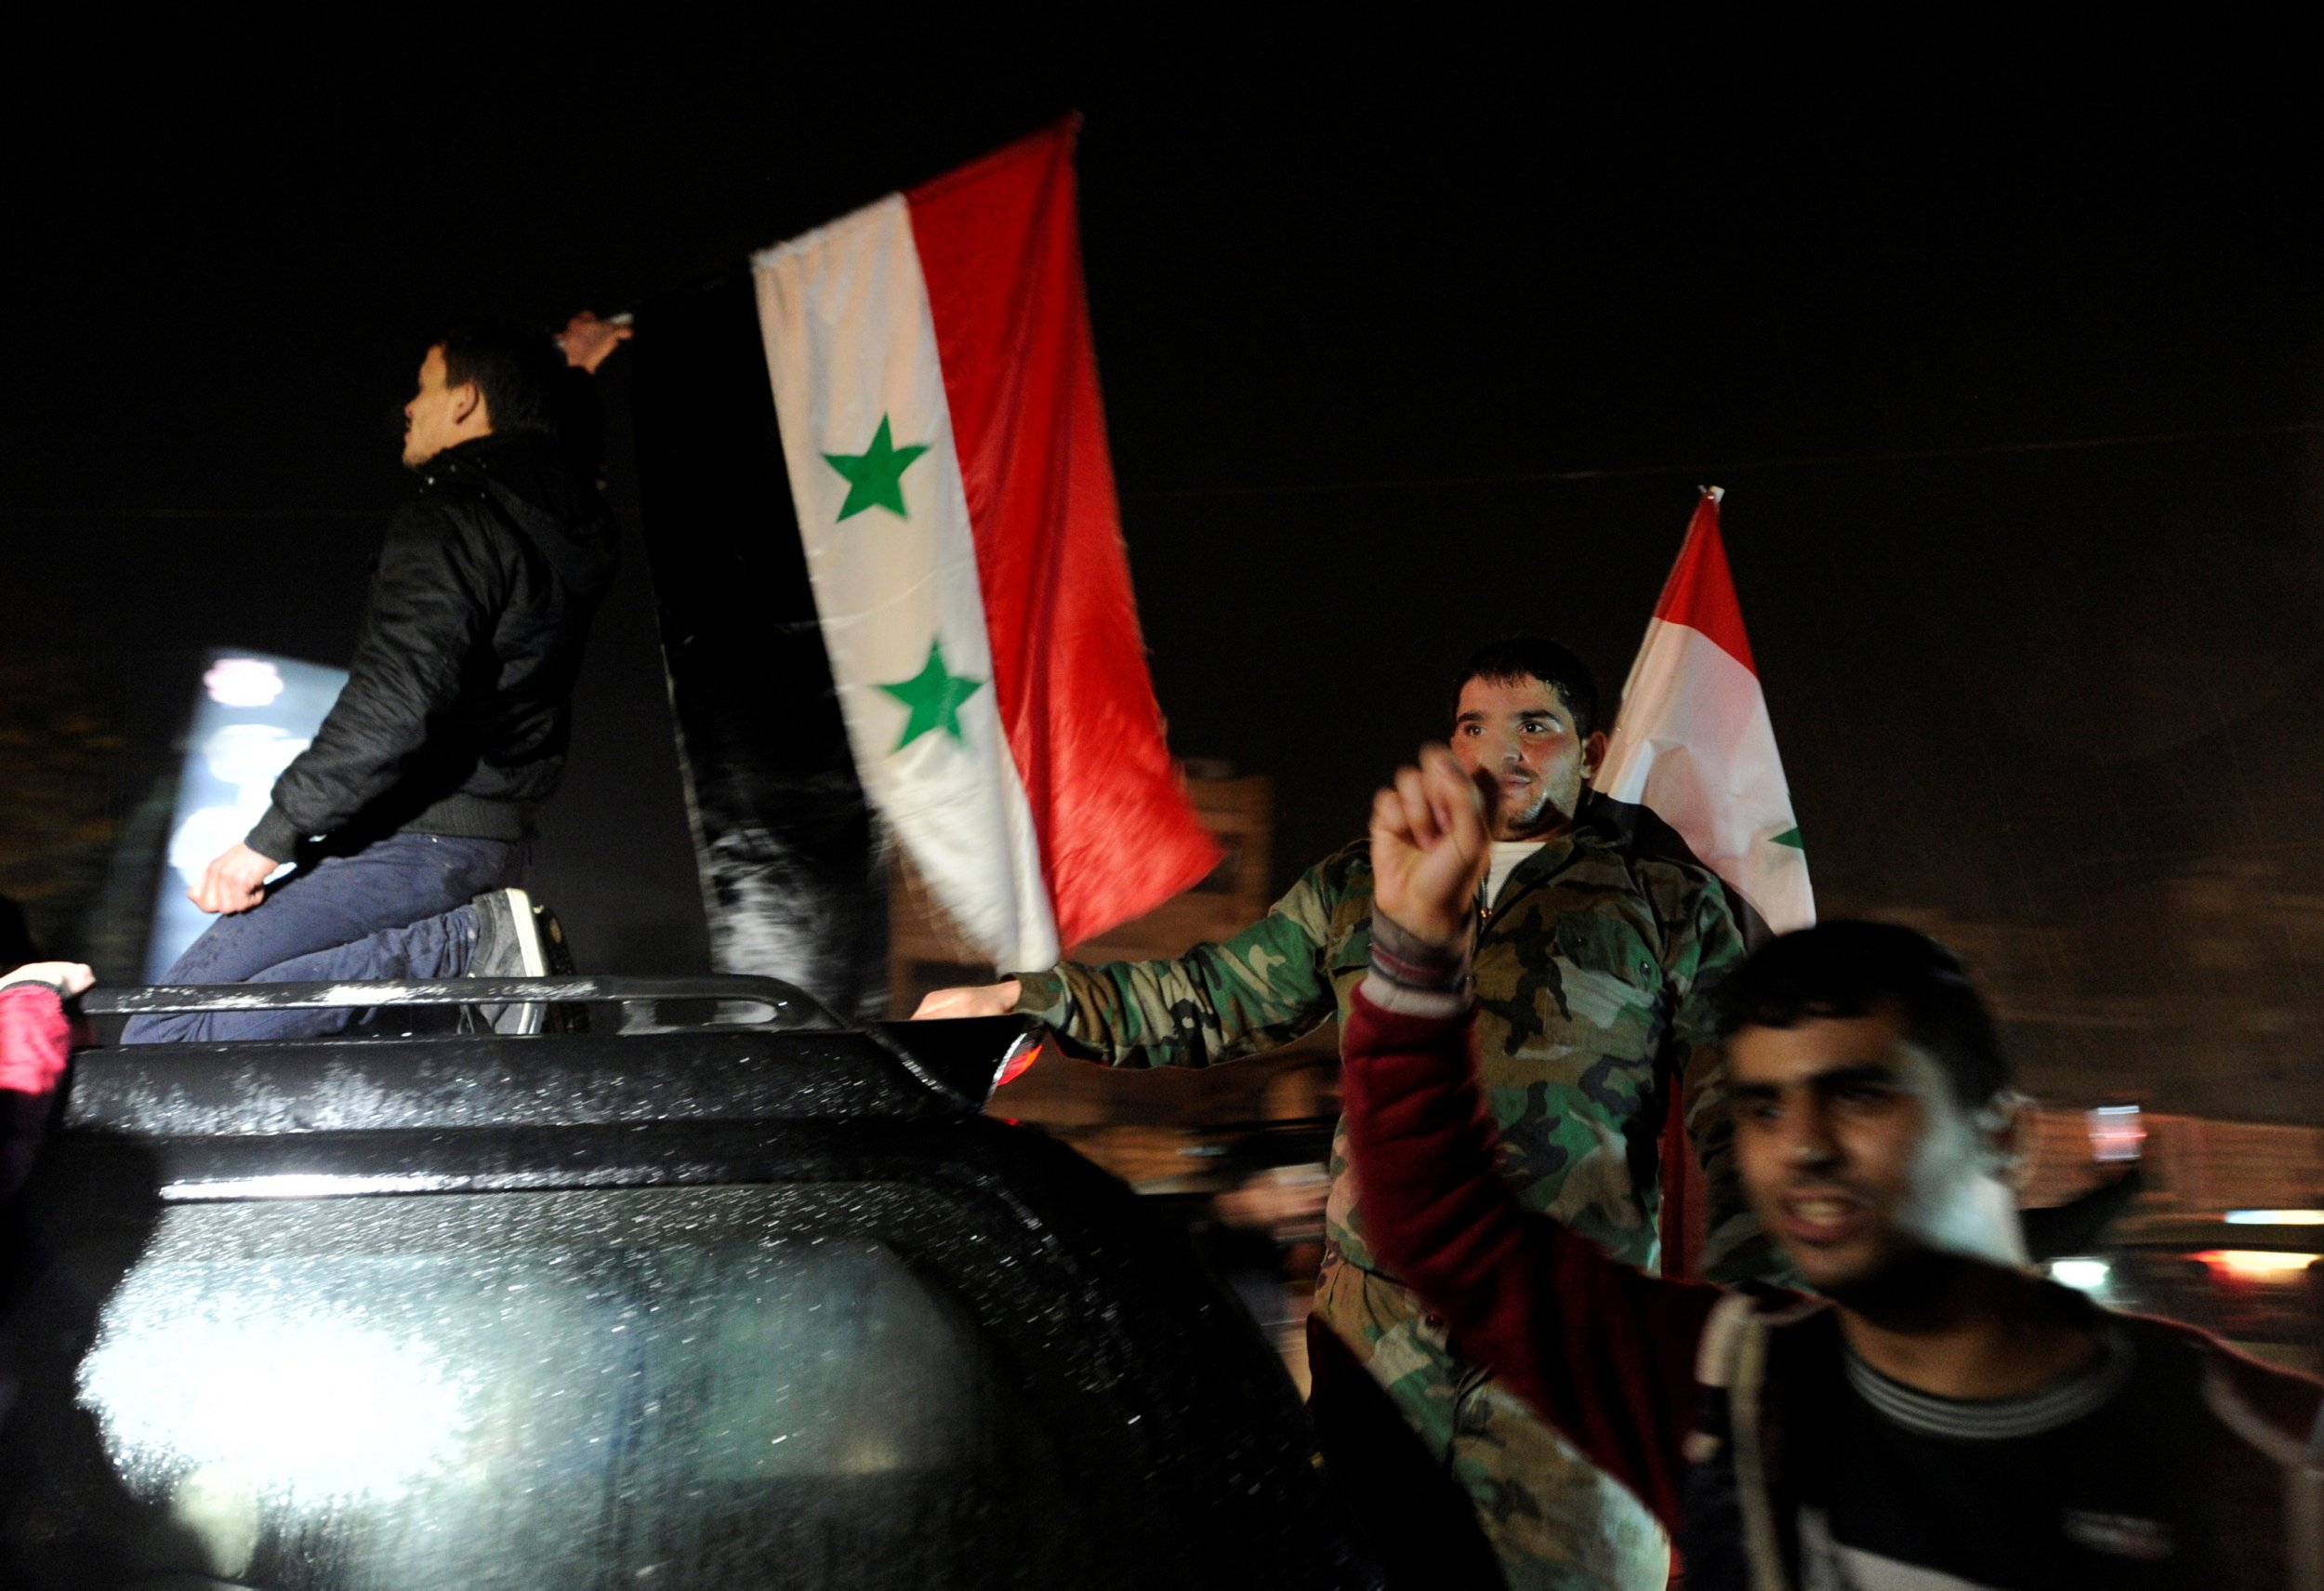 Aleppo Assad supporters